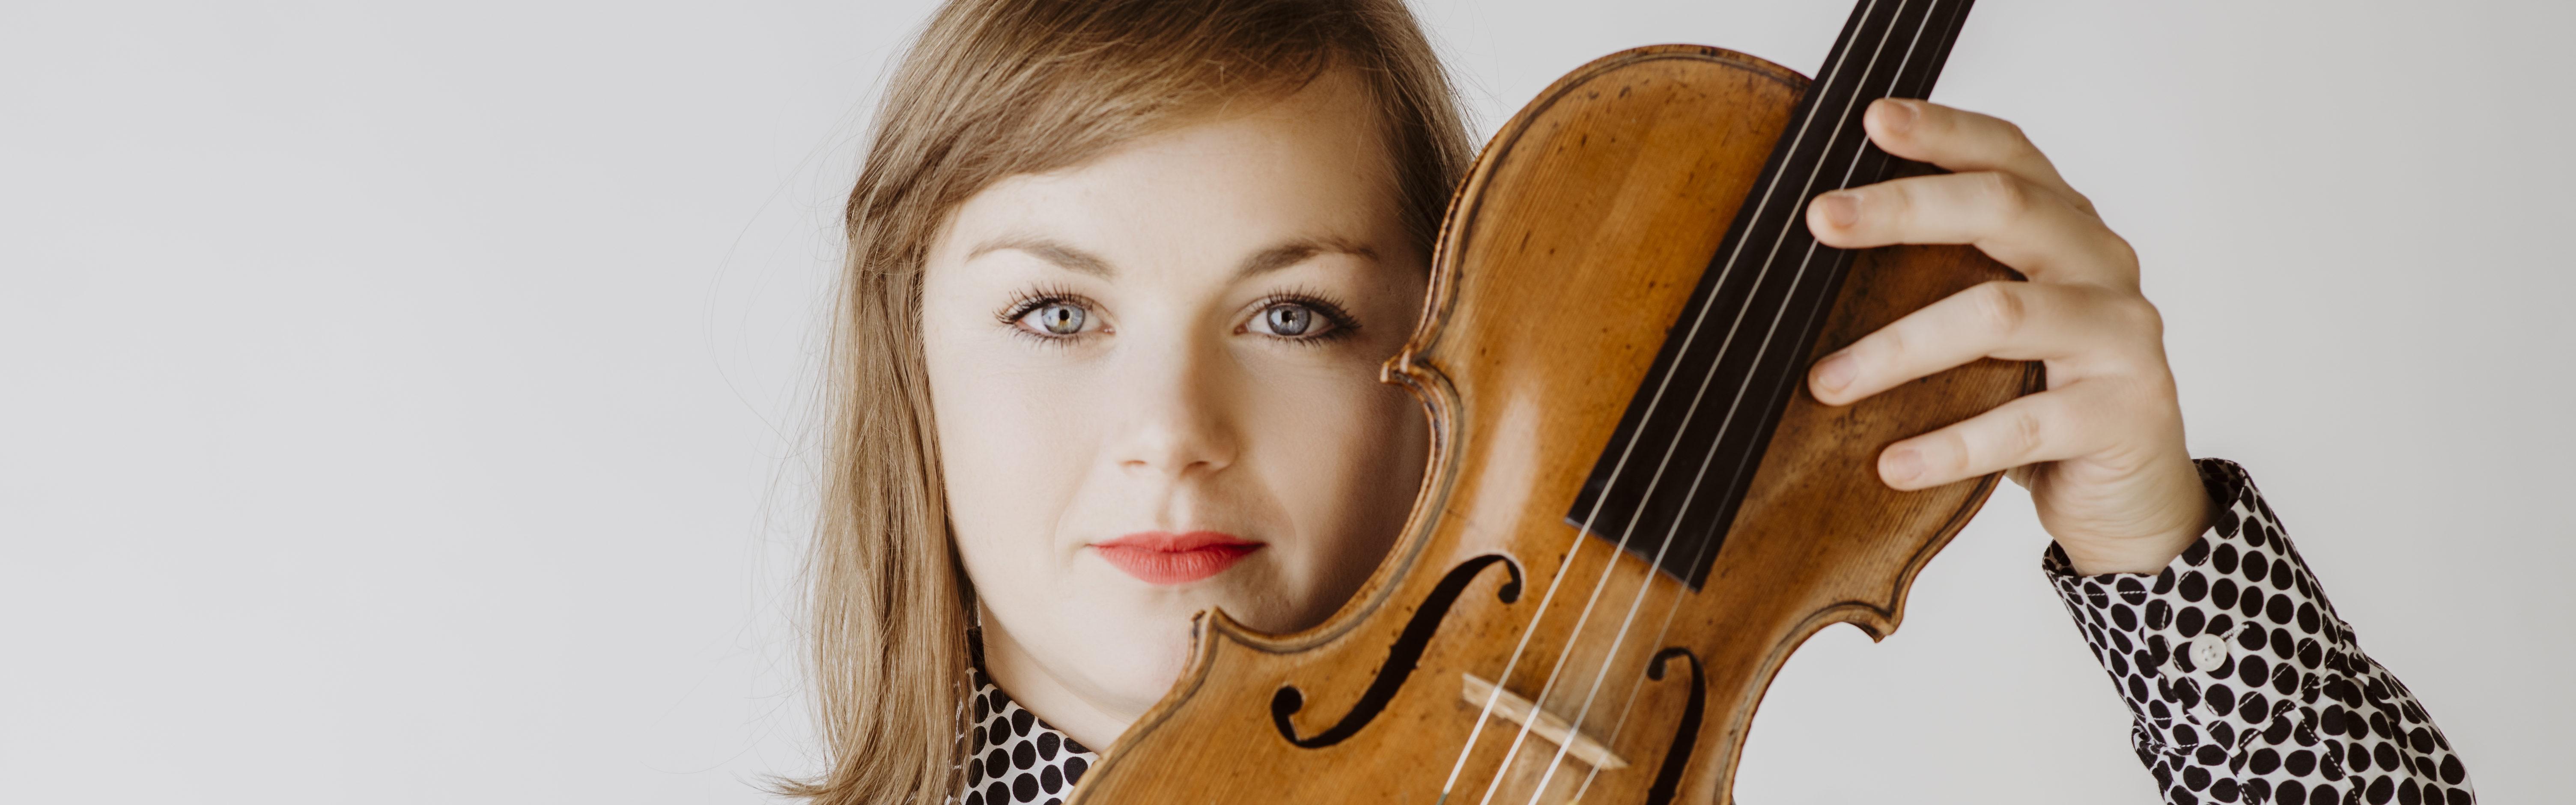 violin.laz@gmail.com